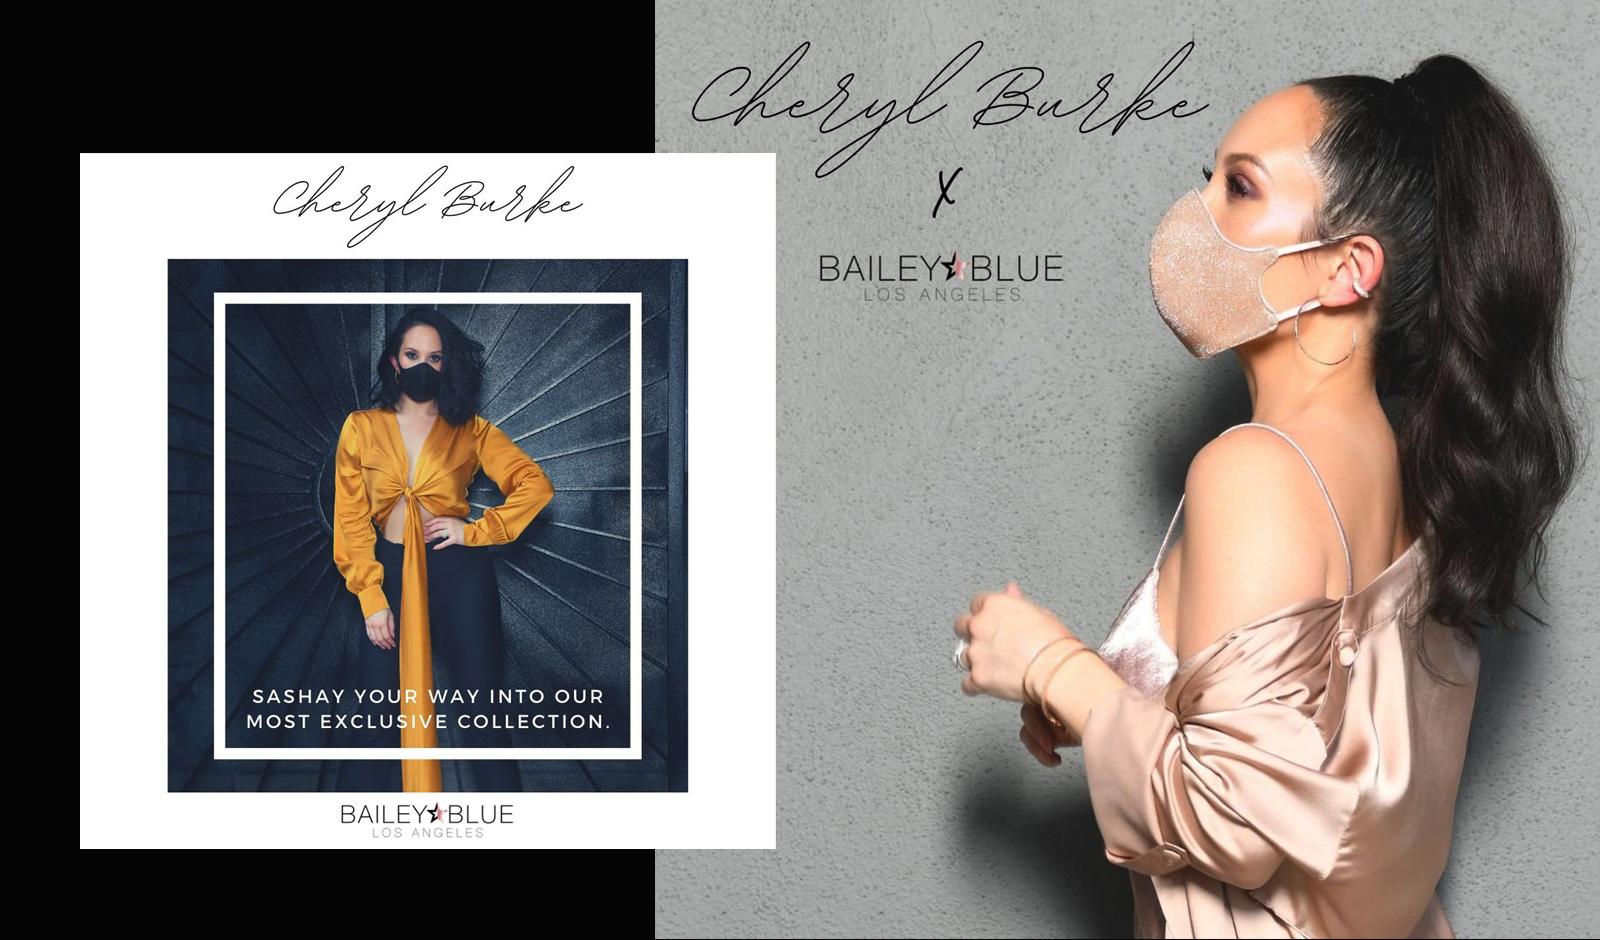 cheryl-burke-bailey-blue-masks